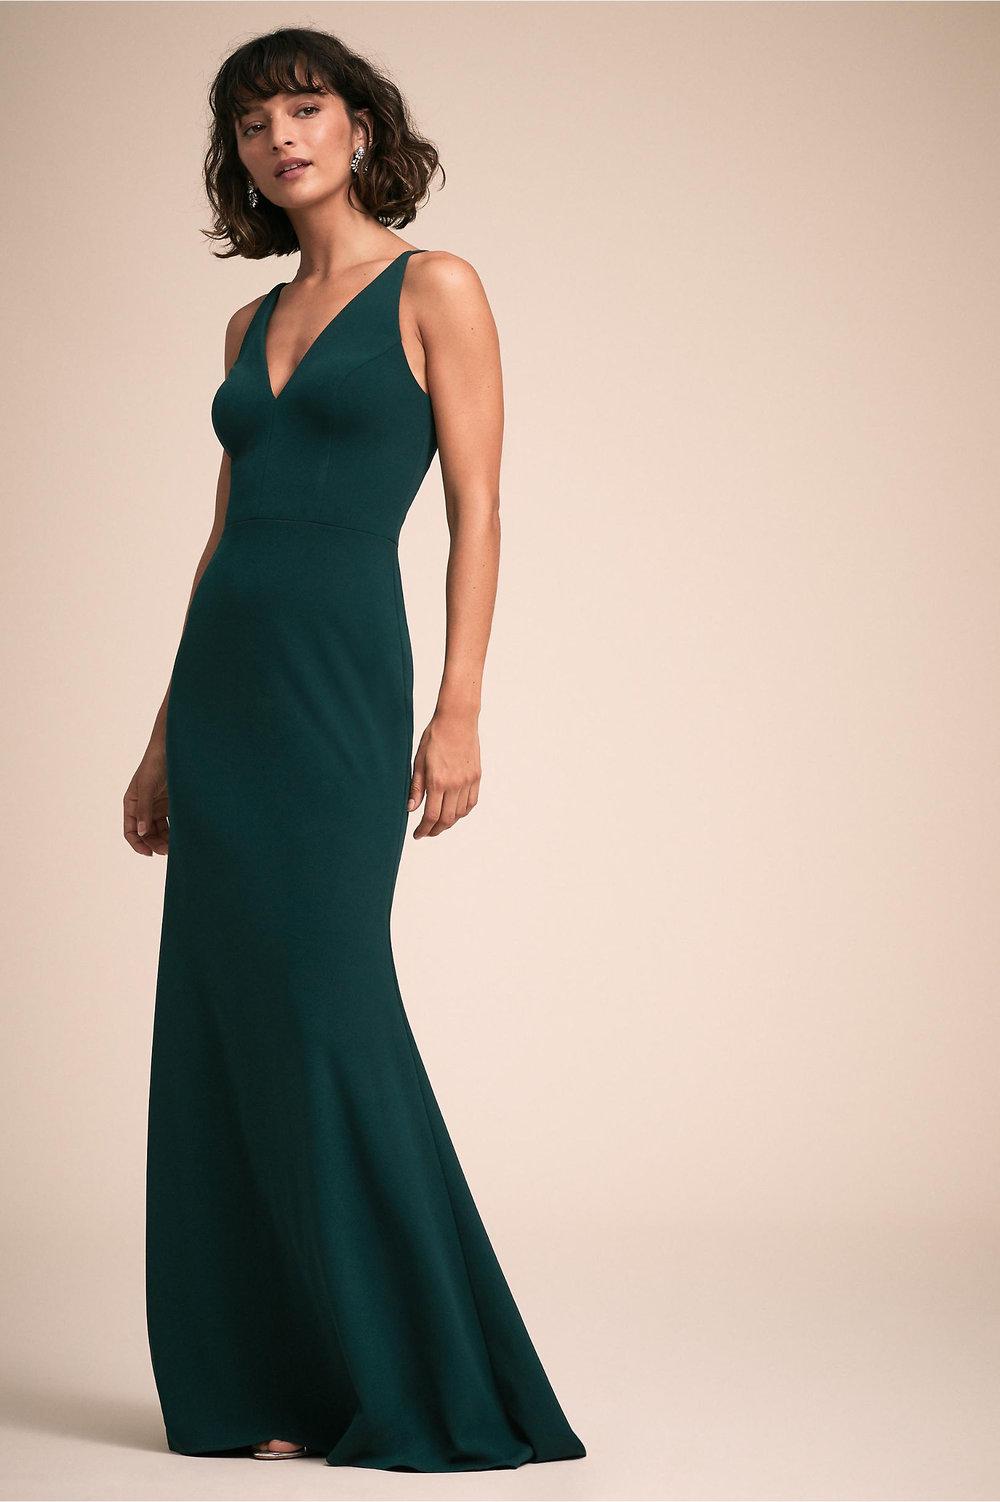 Jones Wedding Dress in Dark Emerald by BHLDN